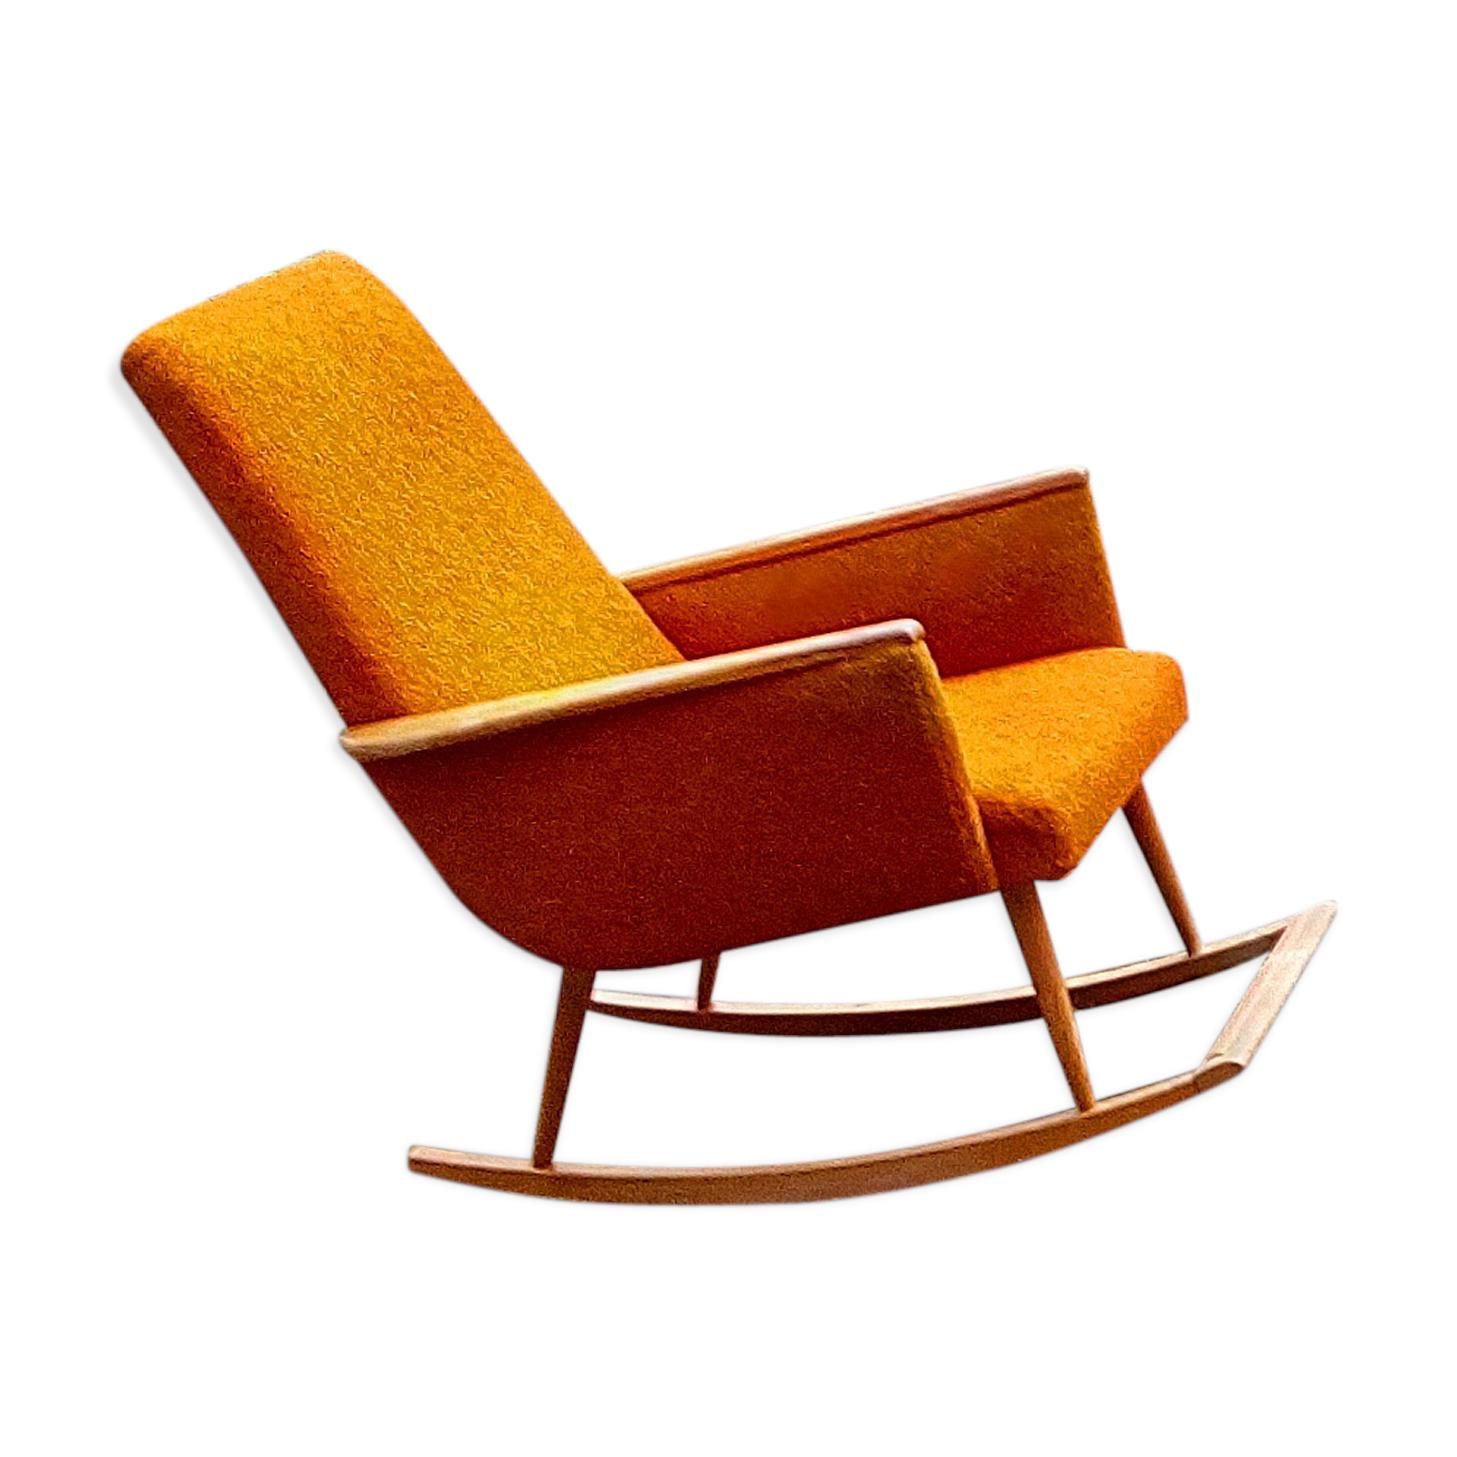 Rocking chair scandinave années 50-60 orange